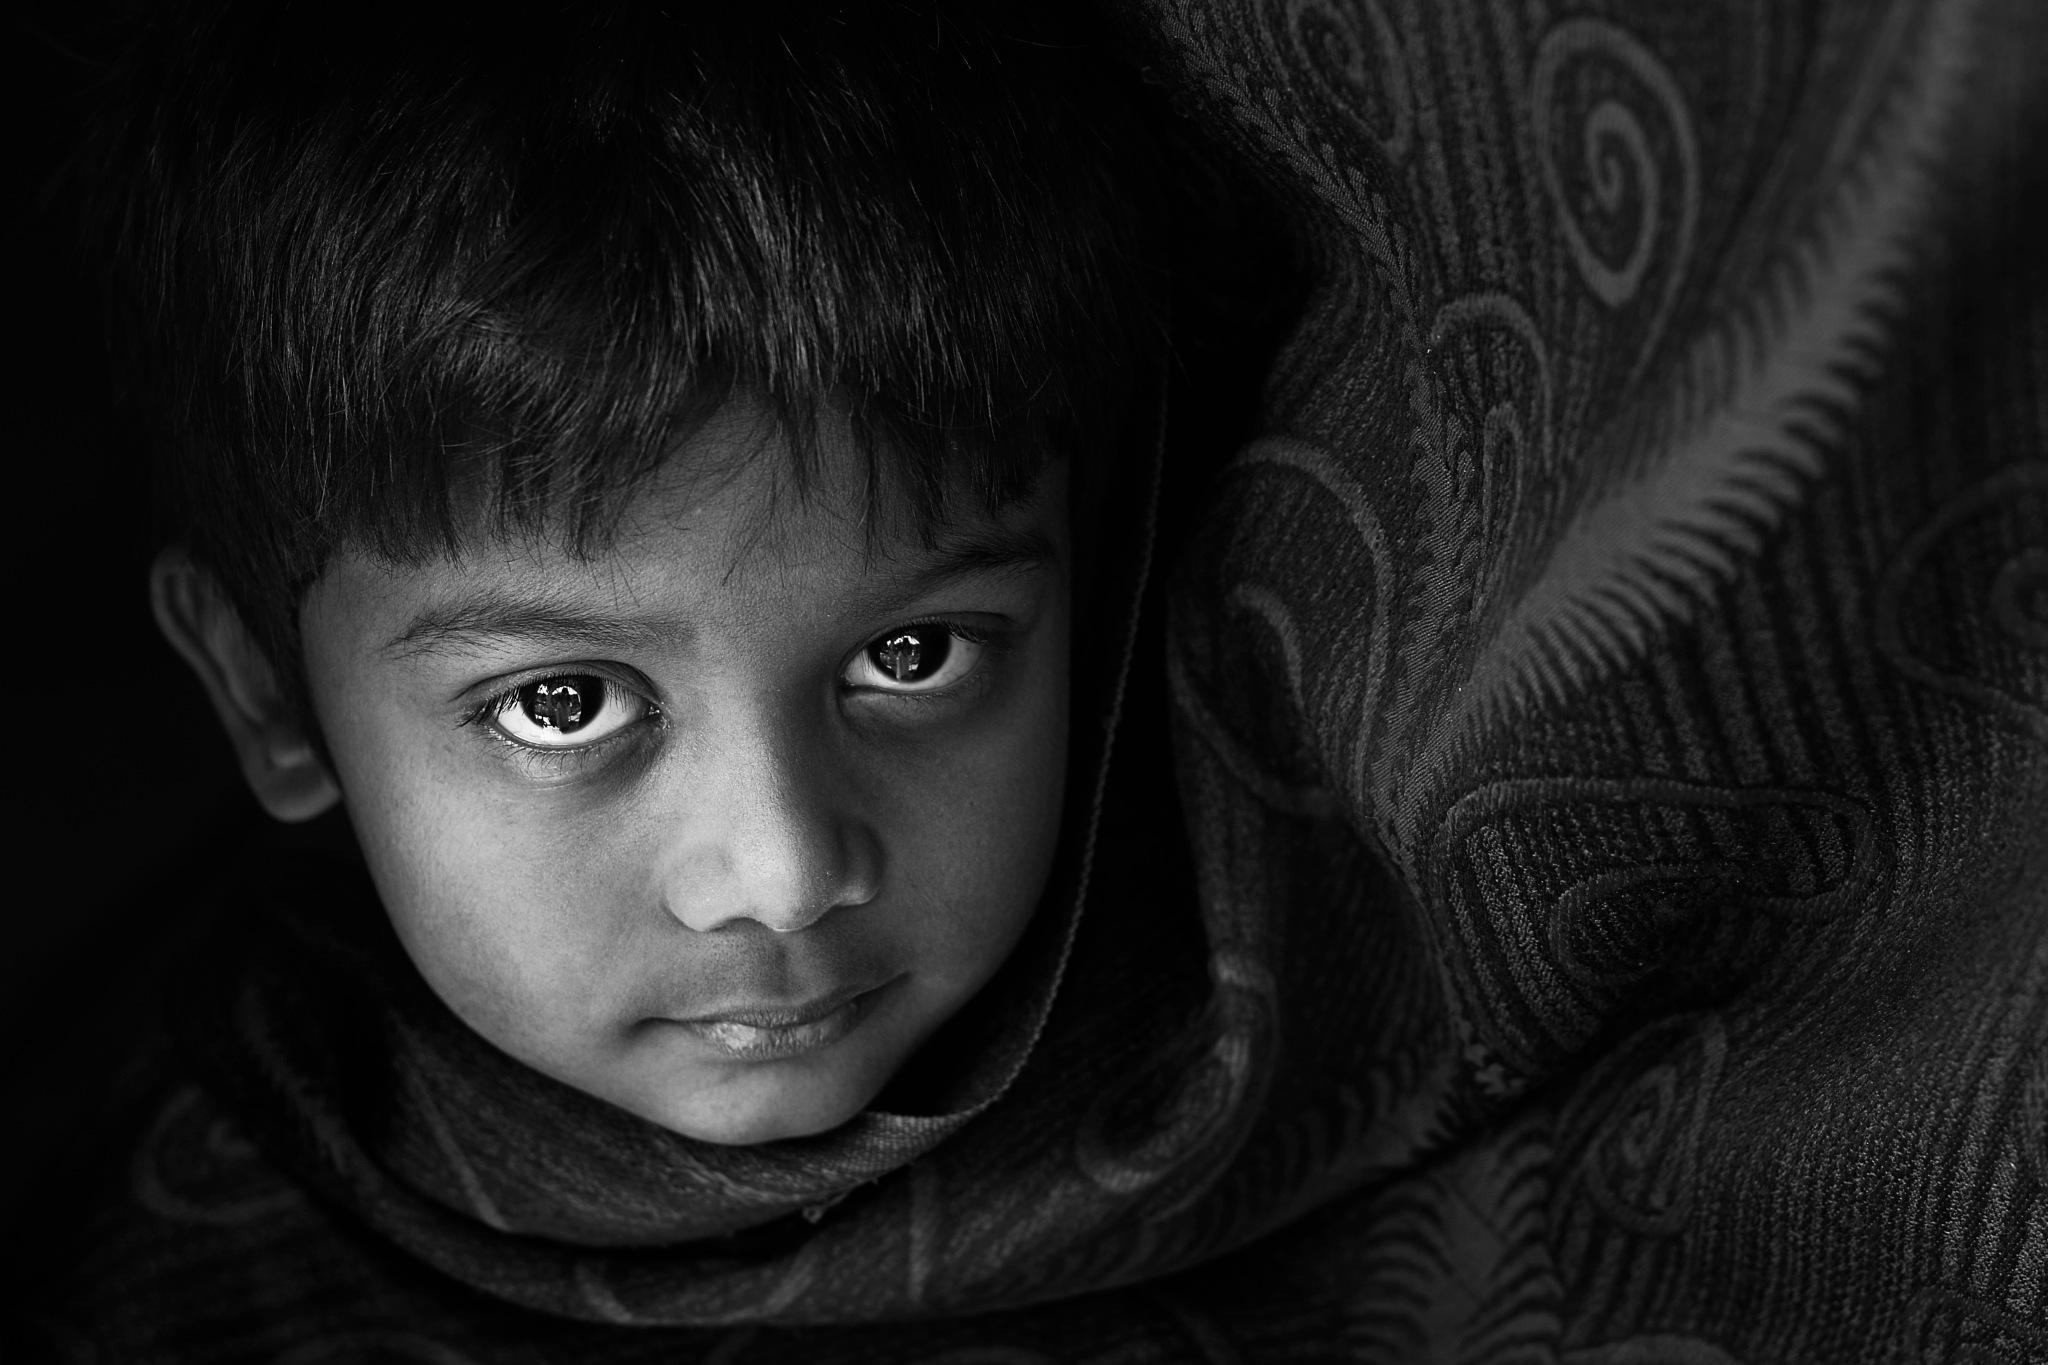 Different Moods by Radhakrishna Rao